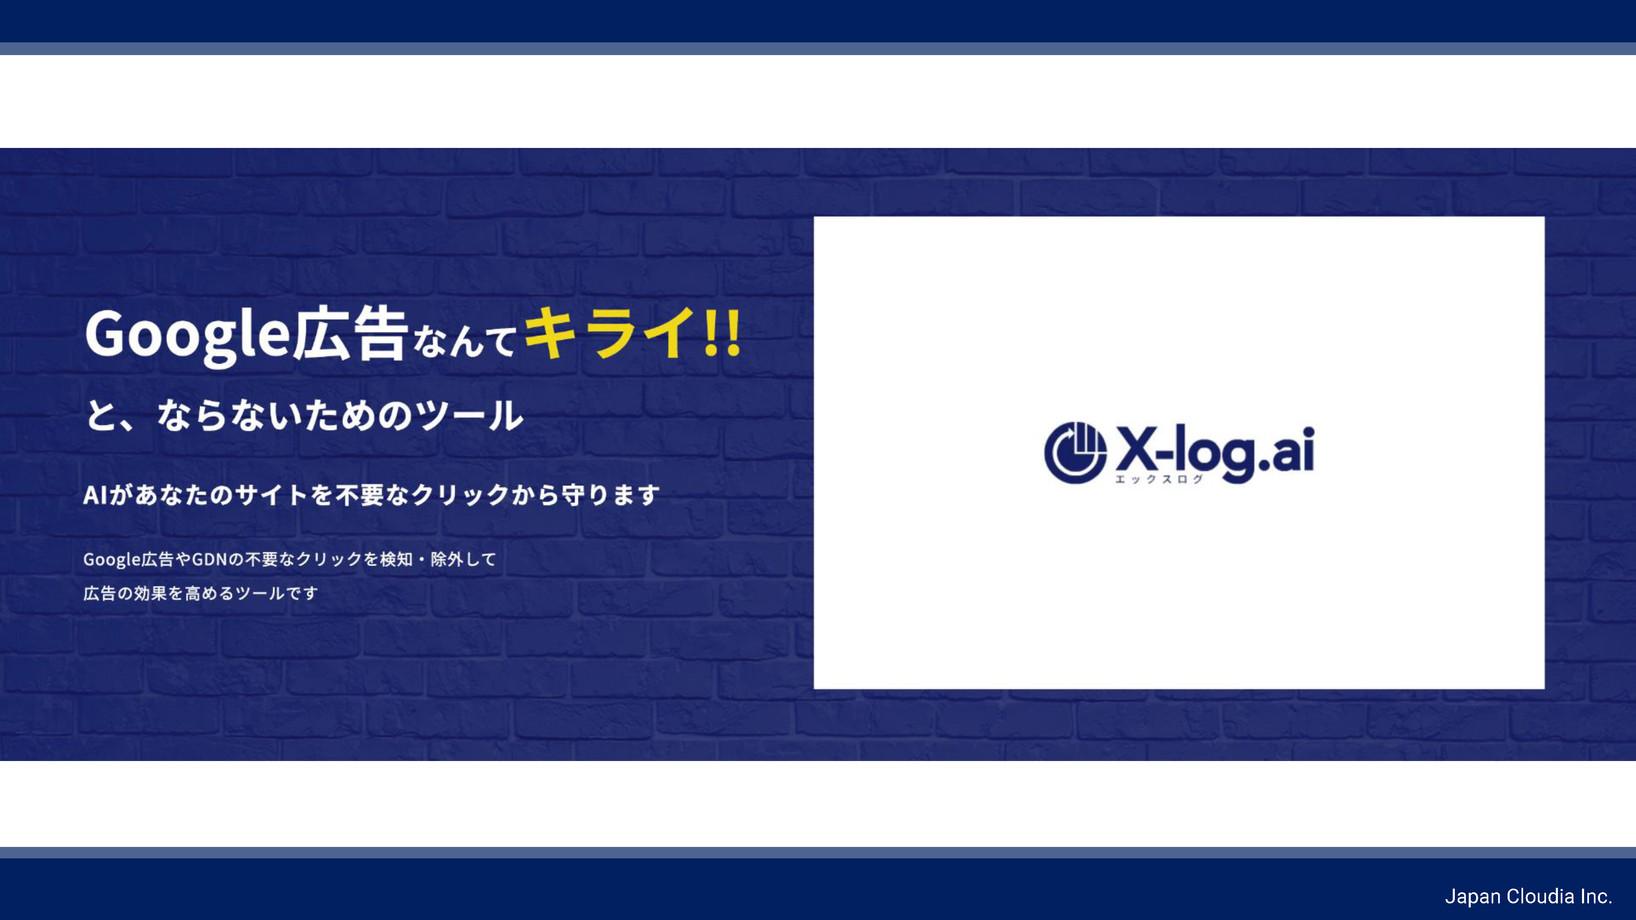 X-log.aiご案内資料_ページ_01.jpg